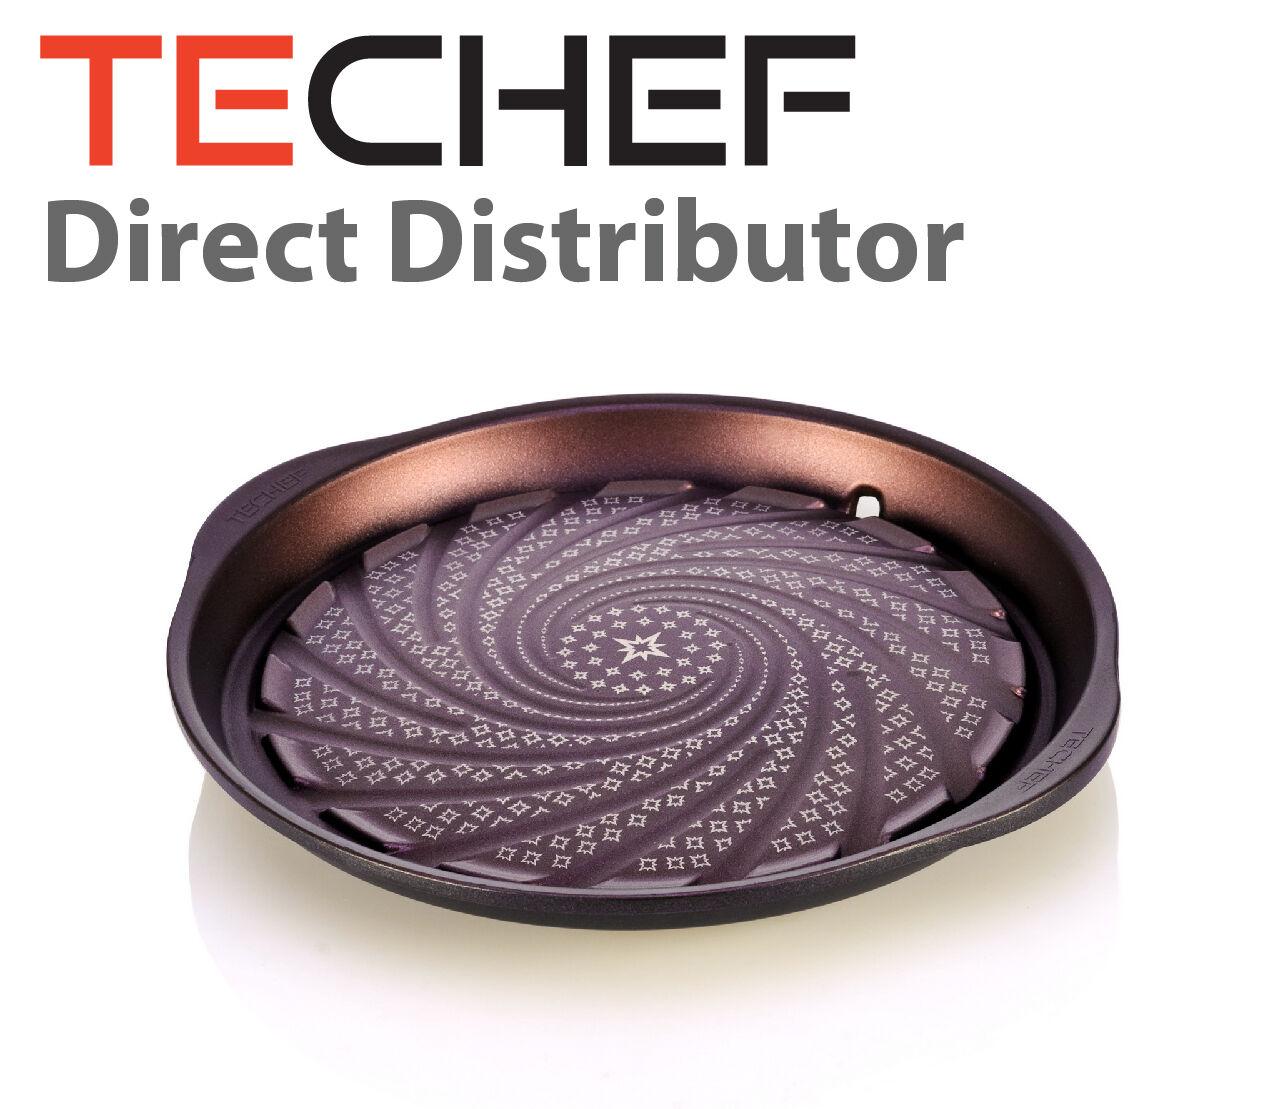 Korean BBQ StoveTop Non-Stick Grill Pan with Teflon Coating